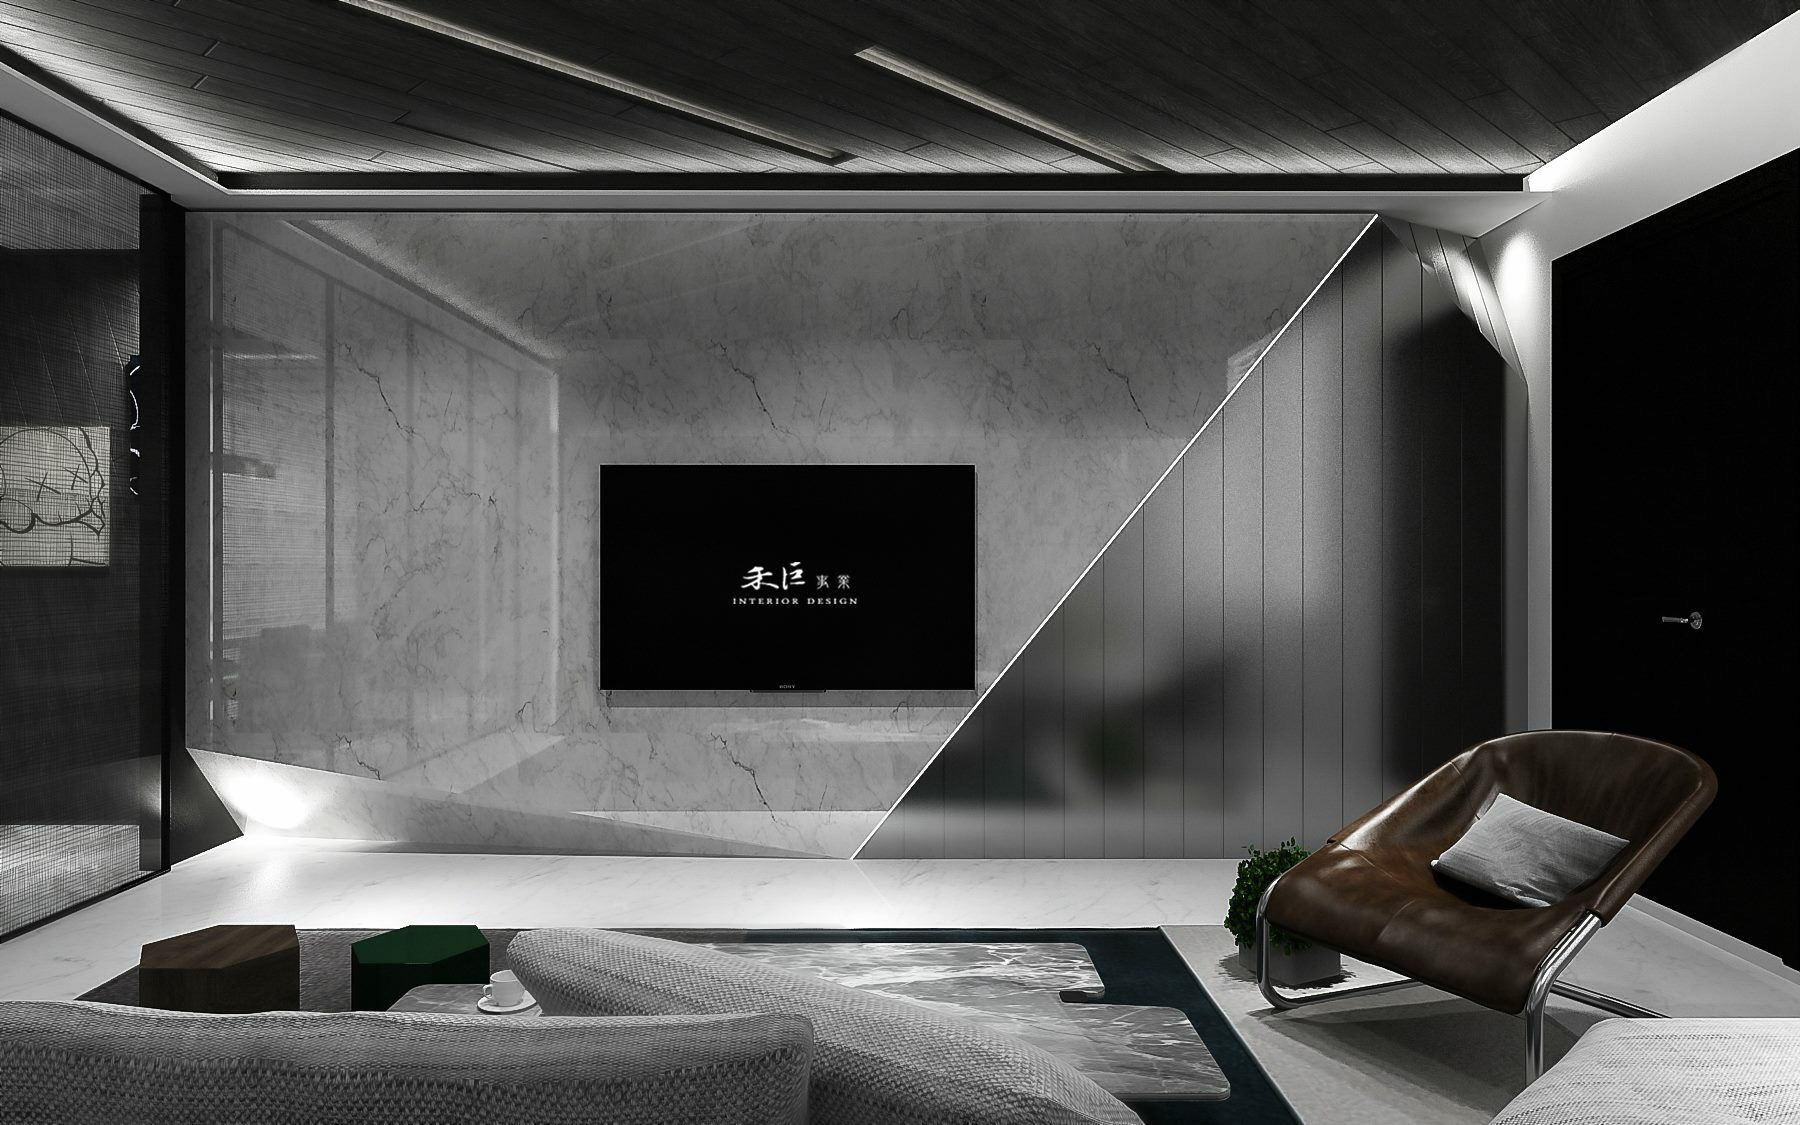 Pin by lianghandu on 室内 家宅 in 2018 pinterest living room